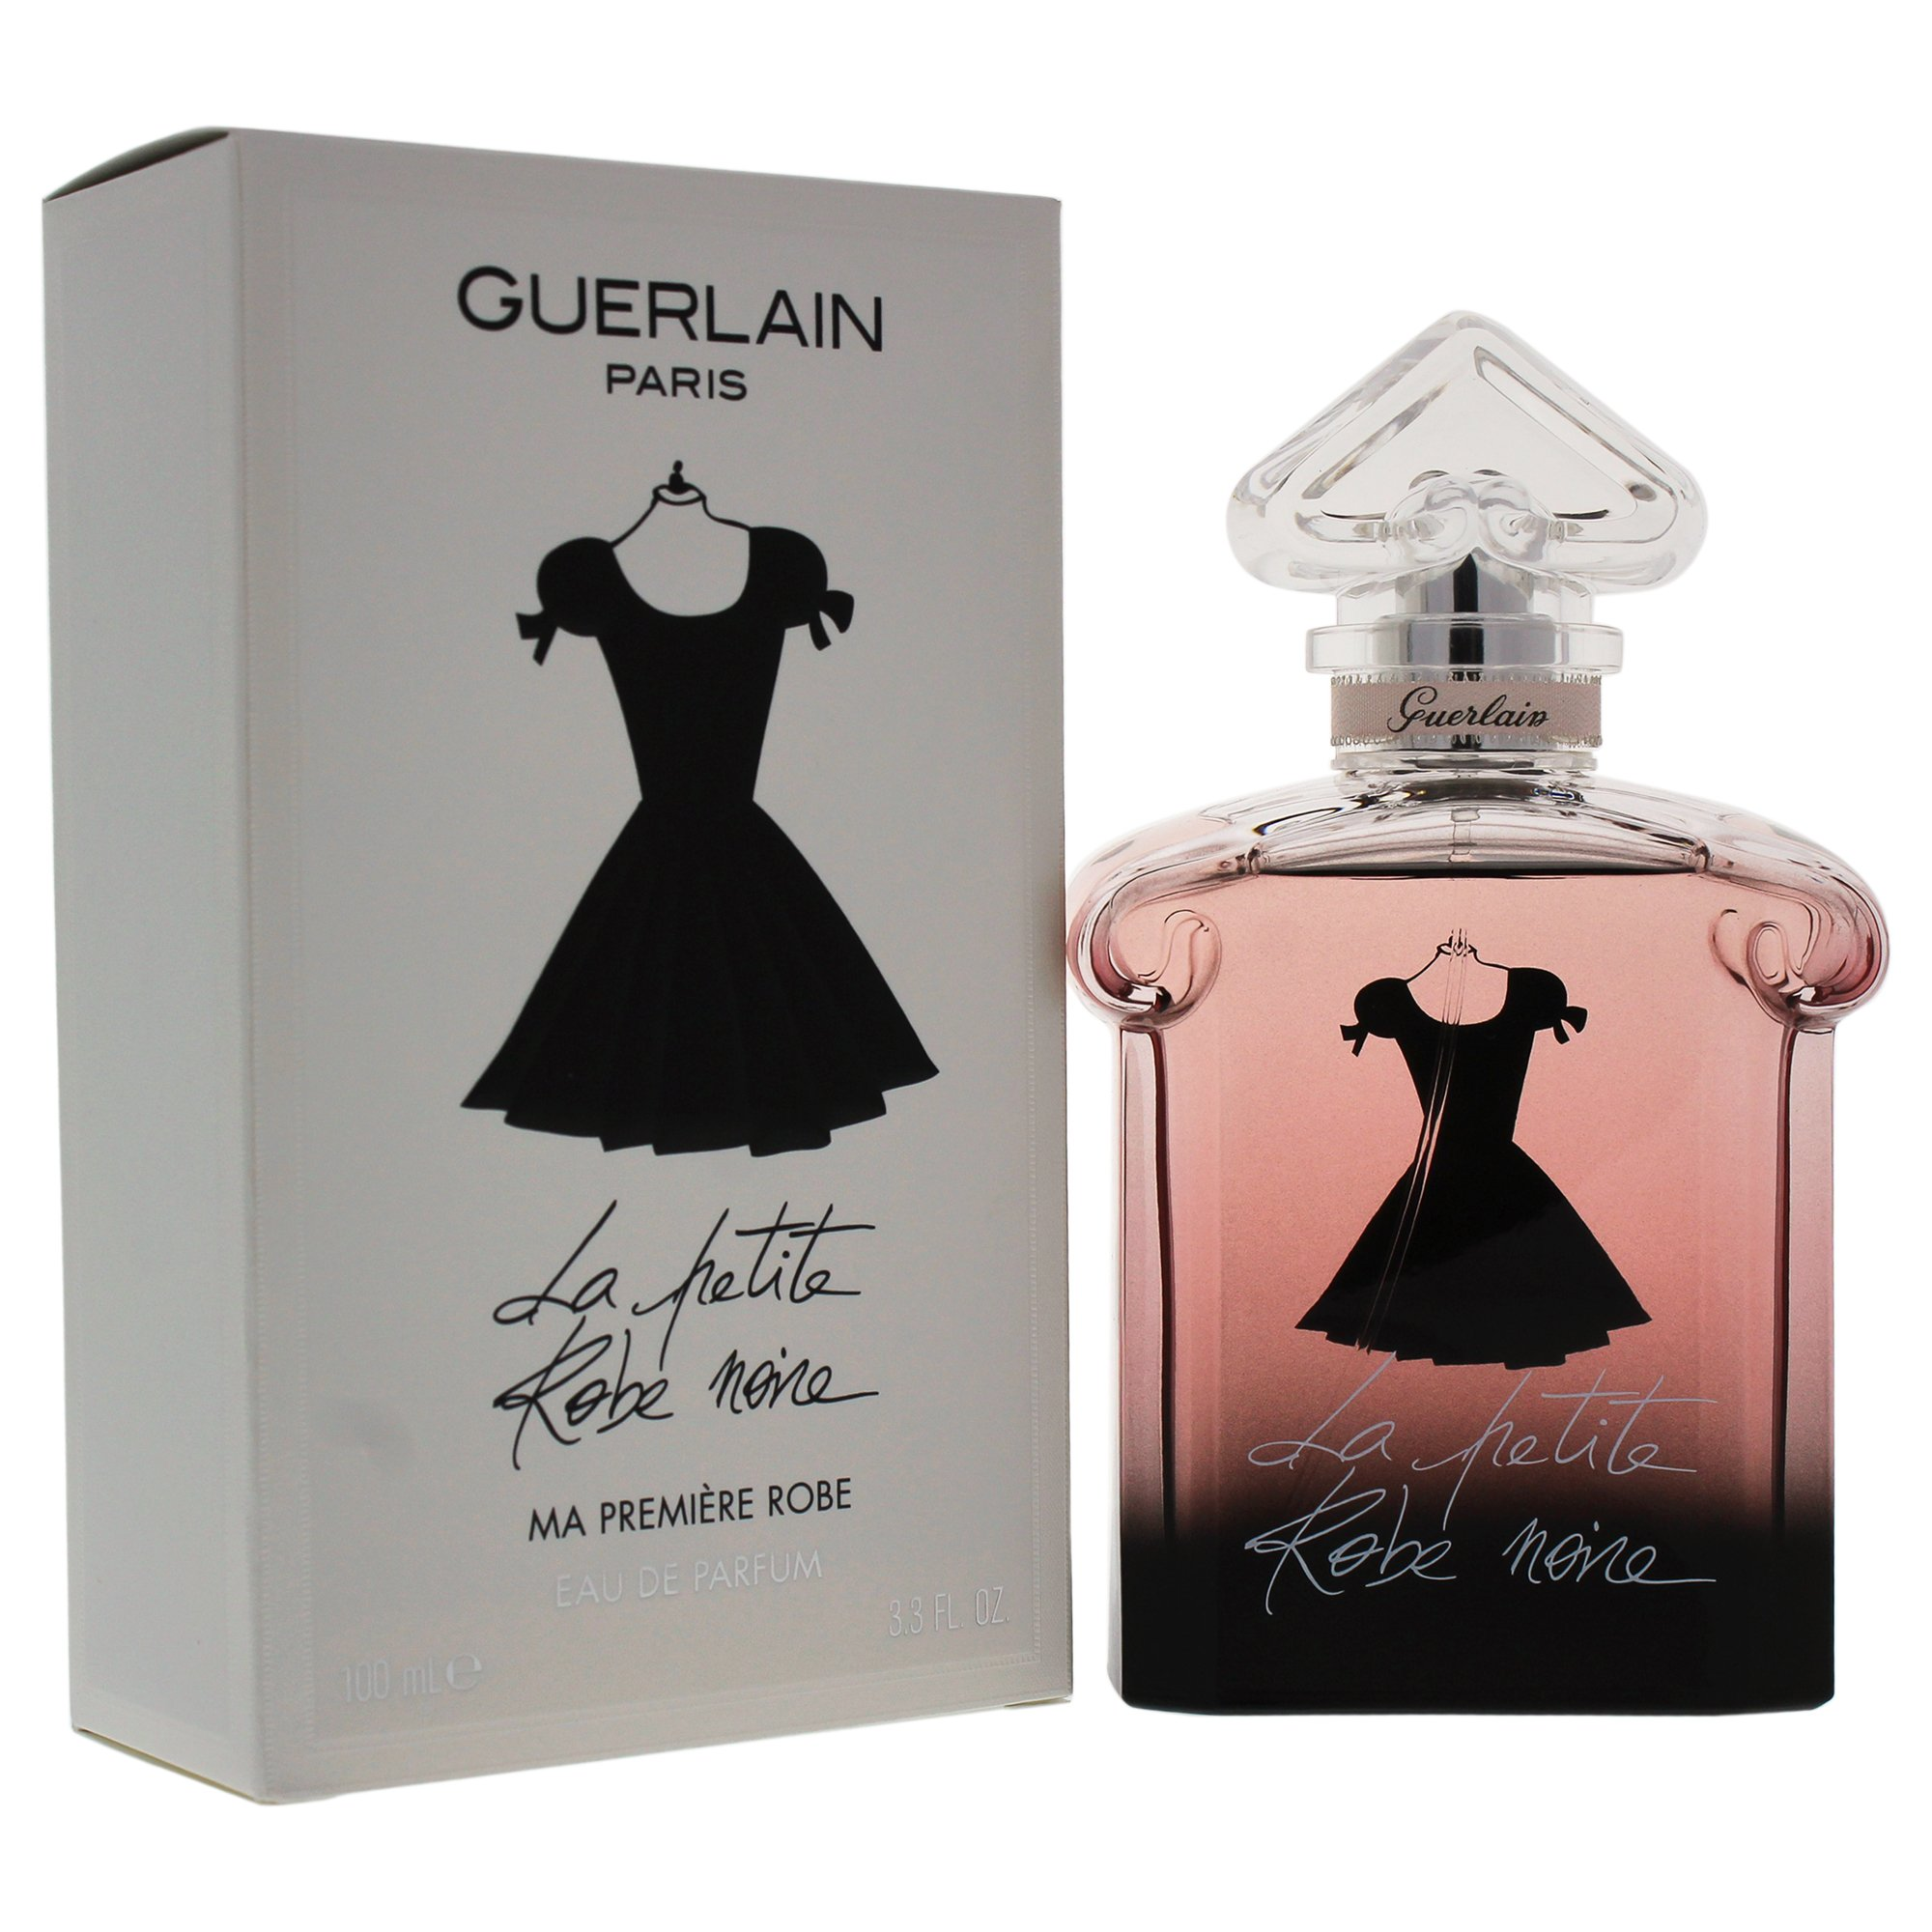 Guerlain Perfume: Amazon.com